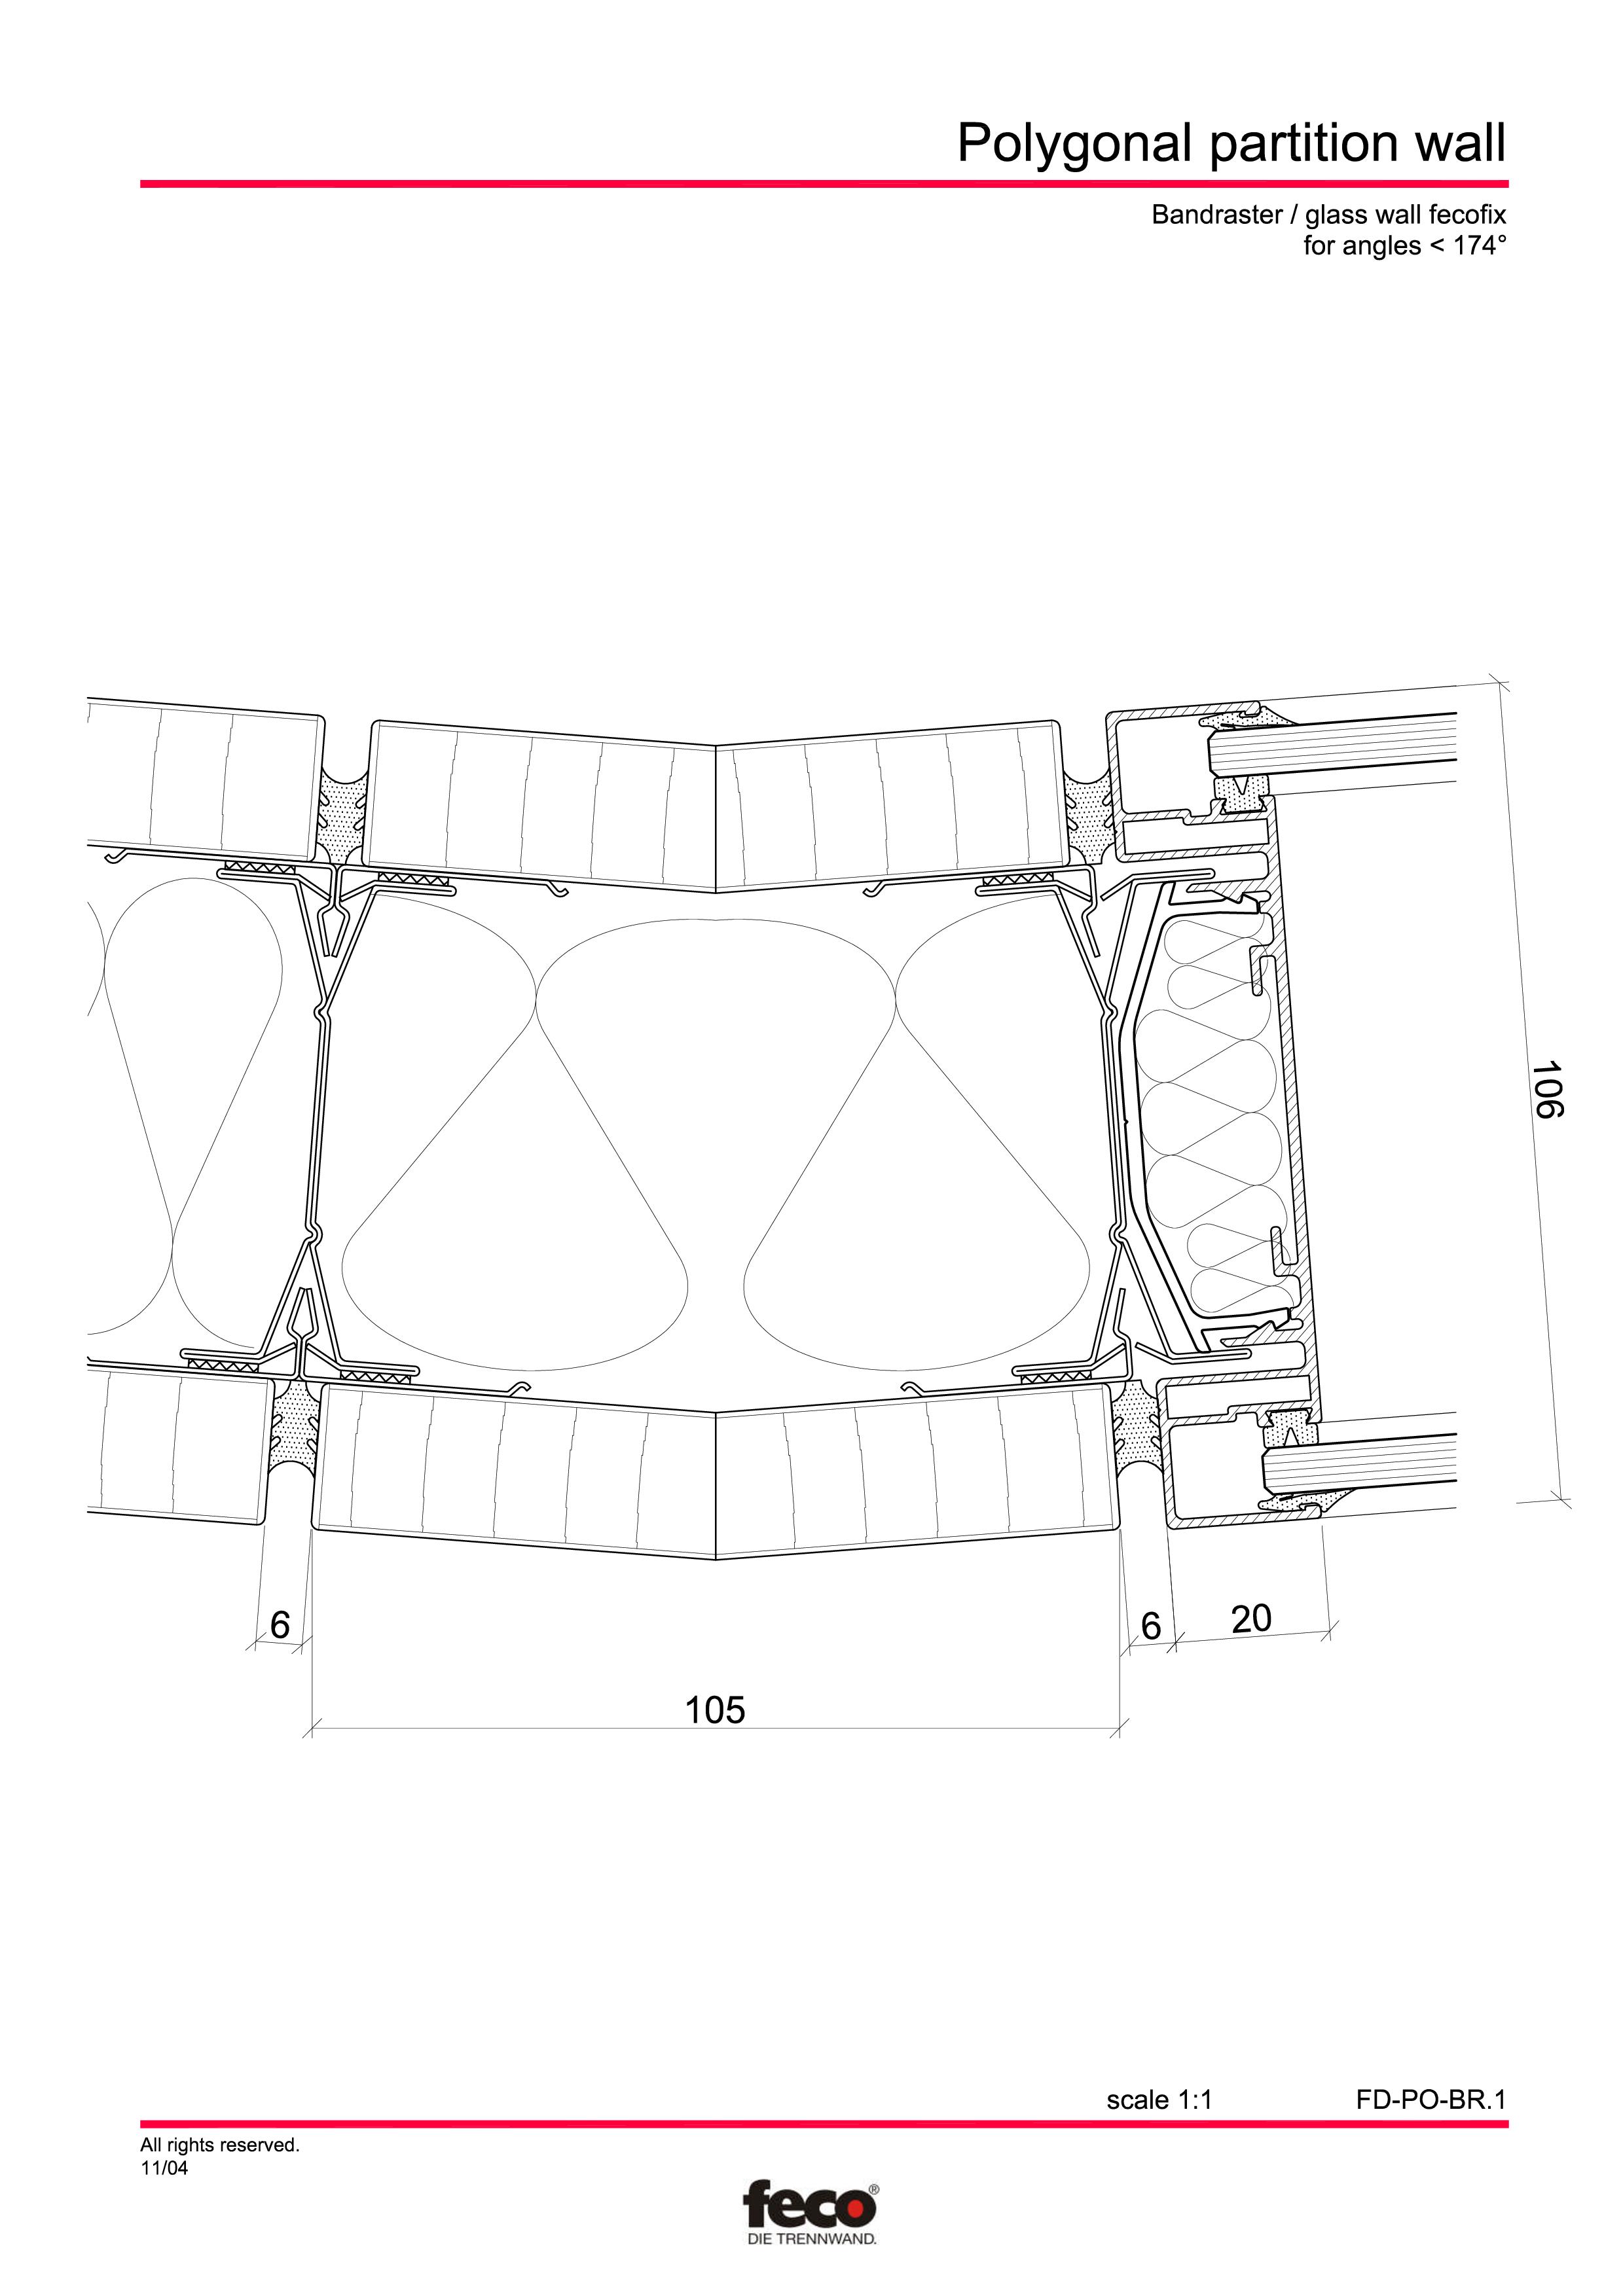 Pagina 1 - CAD-PDF Pereti de compartimentare poligonali FECO Detaliu de montaj FecoFix, FecoPur